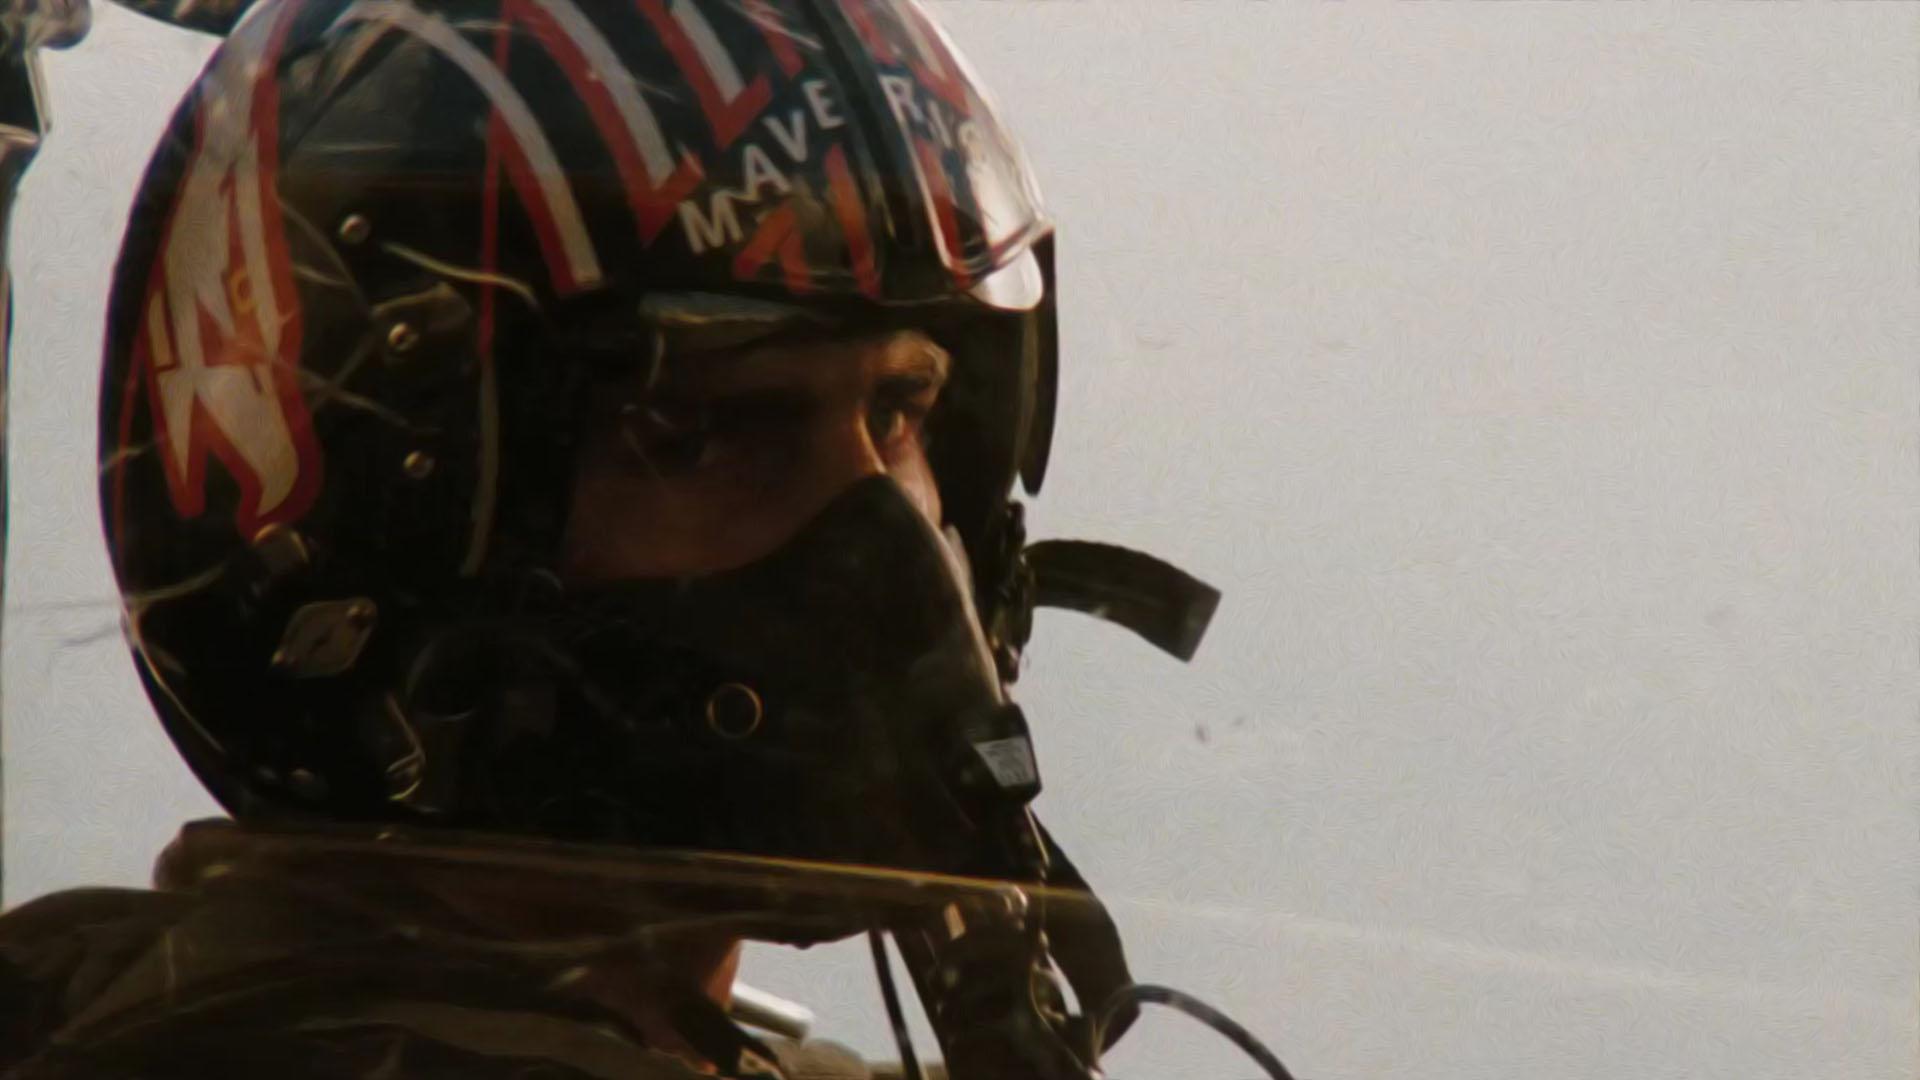 Top Gun Wallpaper Download 1920x1080